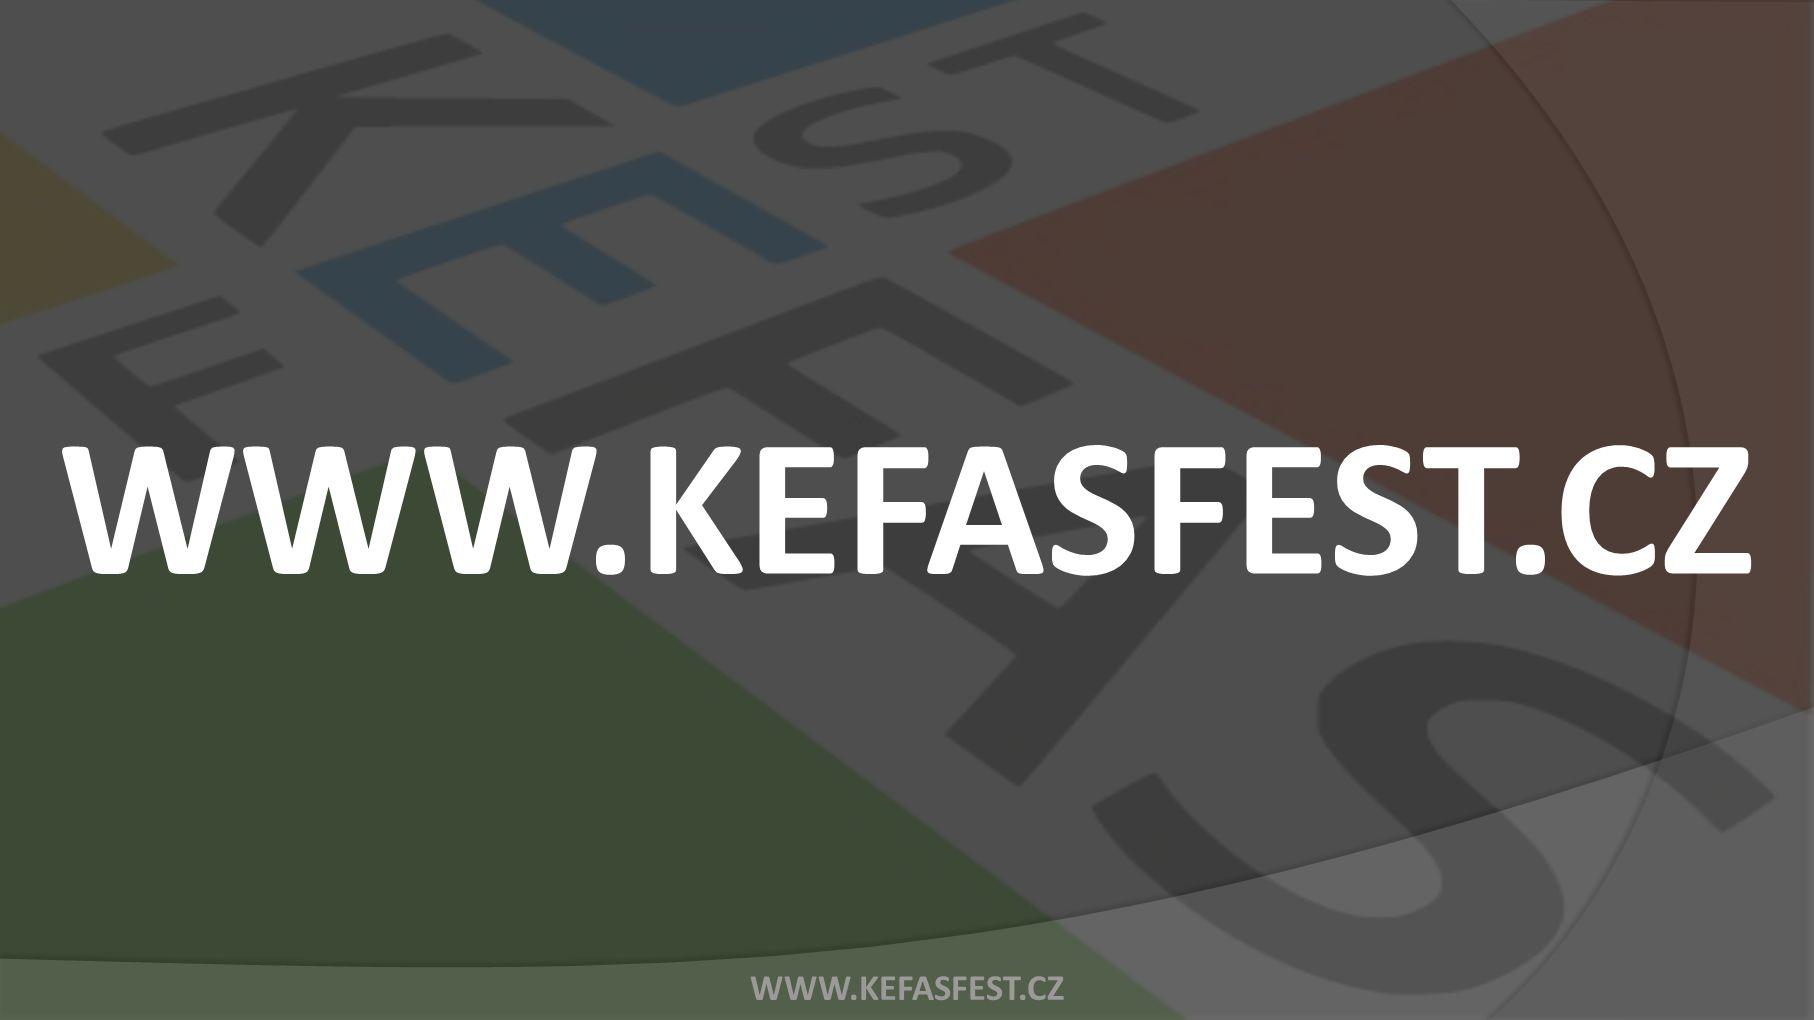 WWW.KEFASFEST.CZ